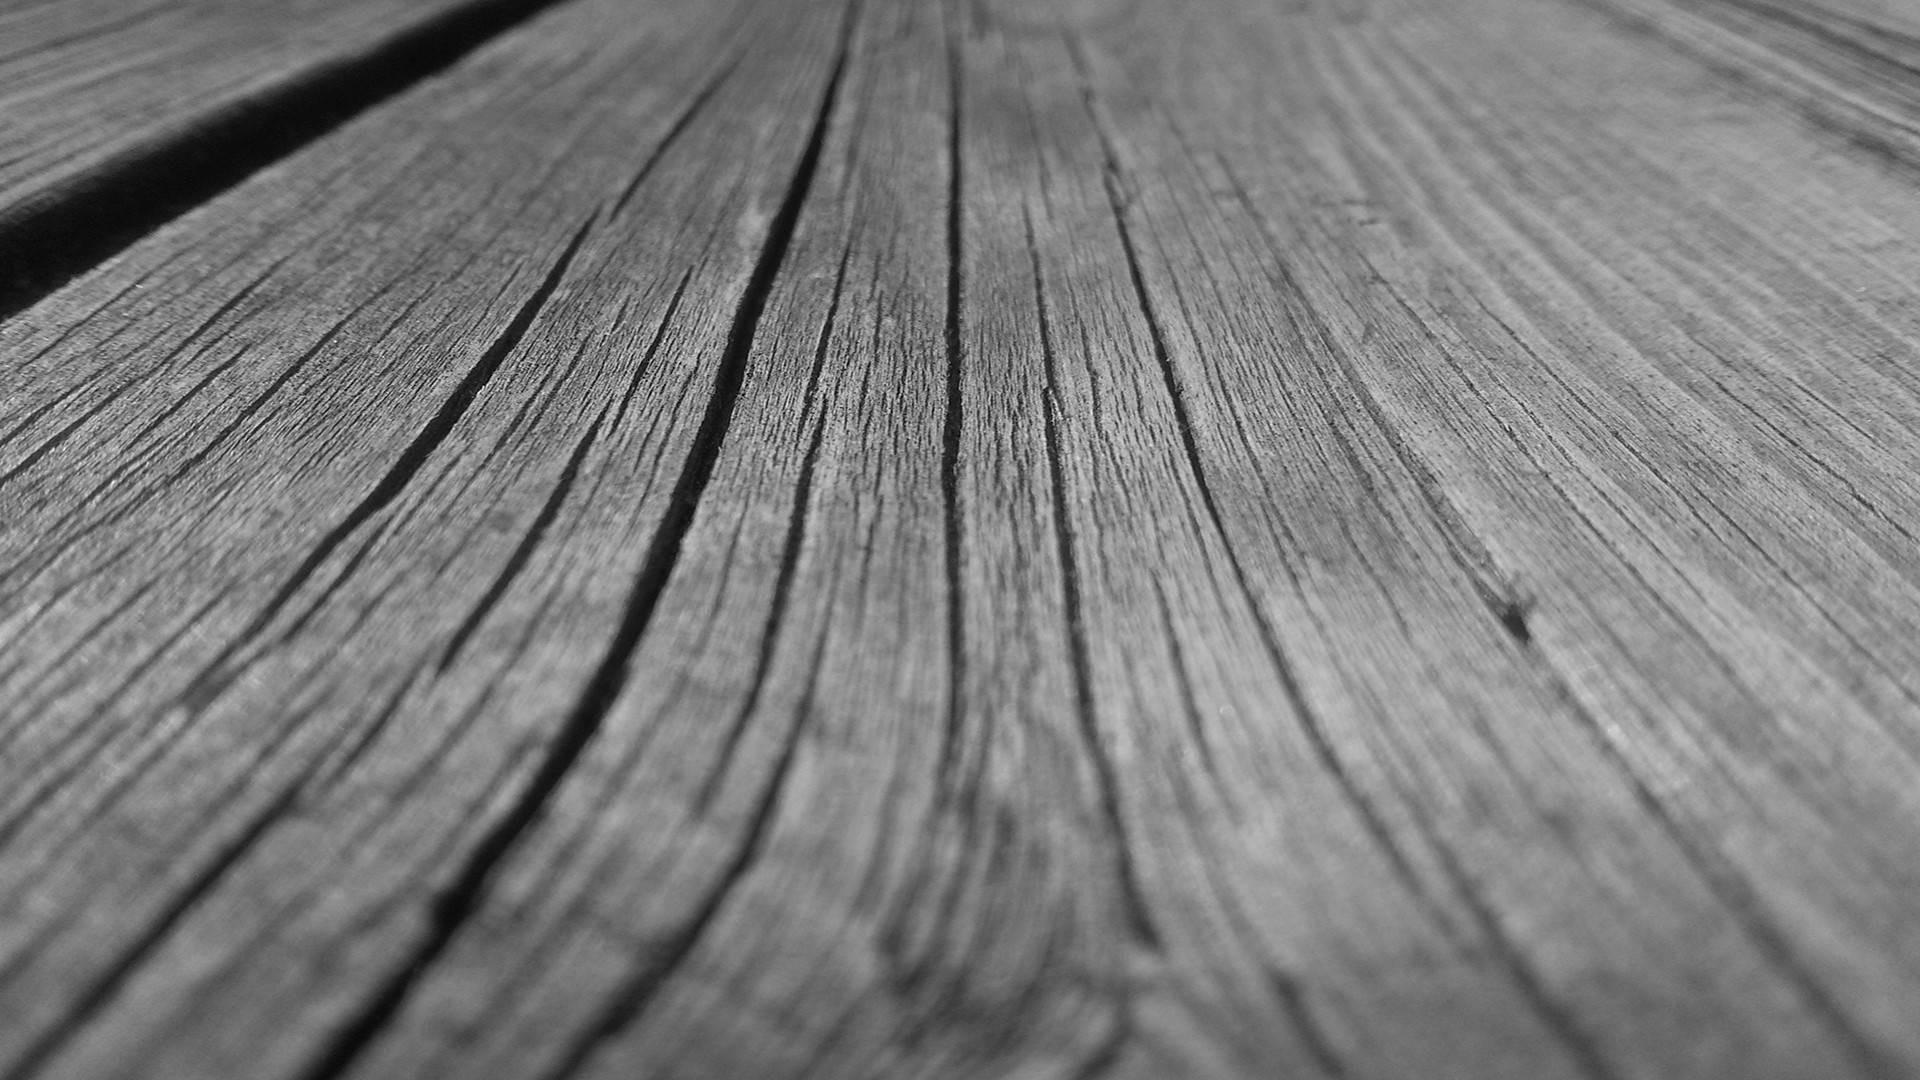 wood grain wallpapers hd – wallpaper cave